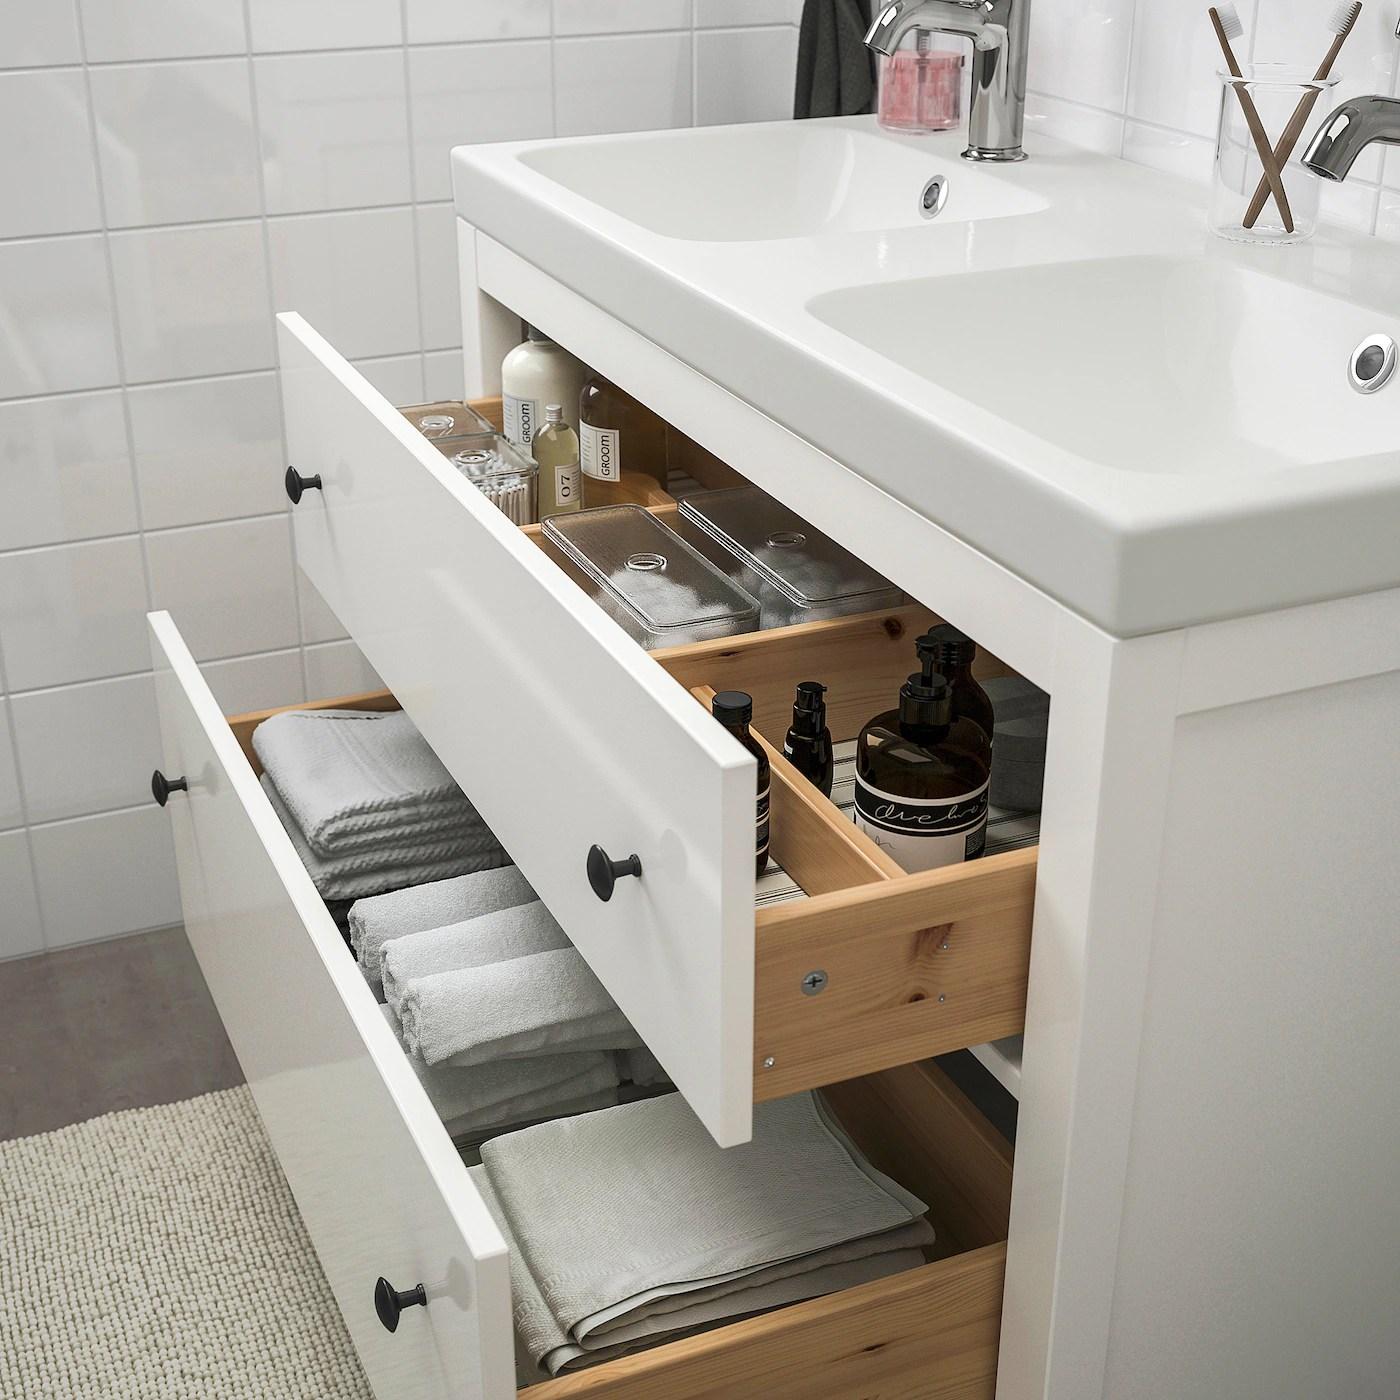 Hemnes Odensvik Mobilier Salle De Bain 5 Pieces Blanc Voxnan Mitigeur Lavabo Ikea